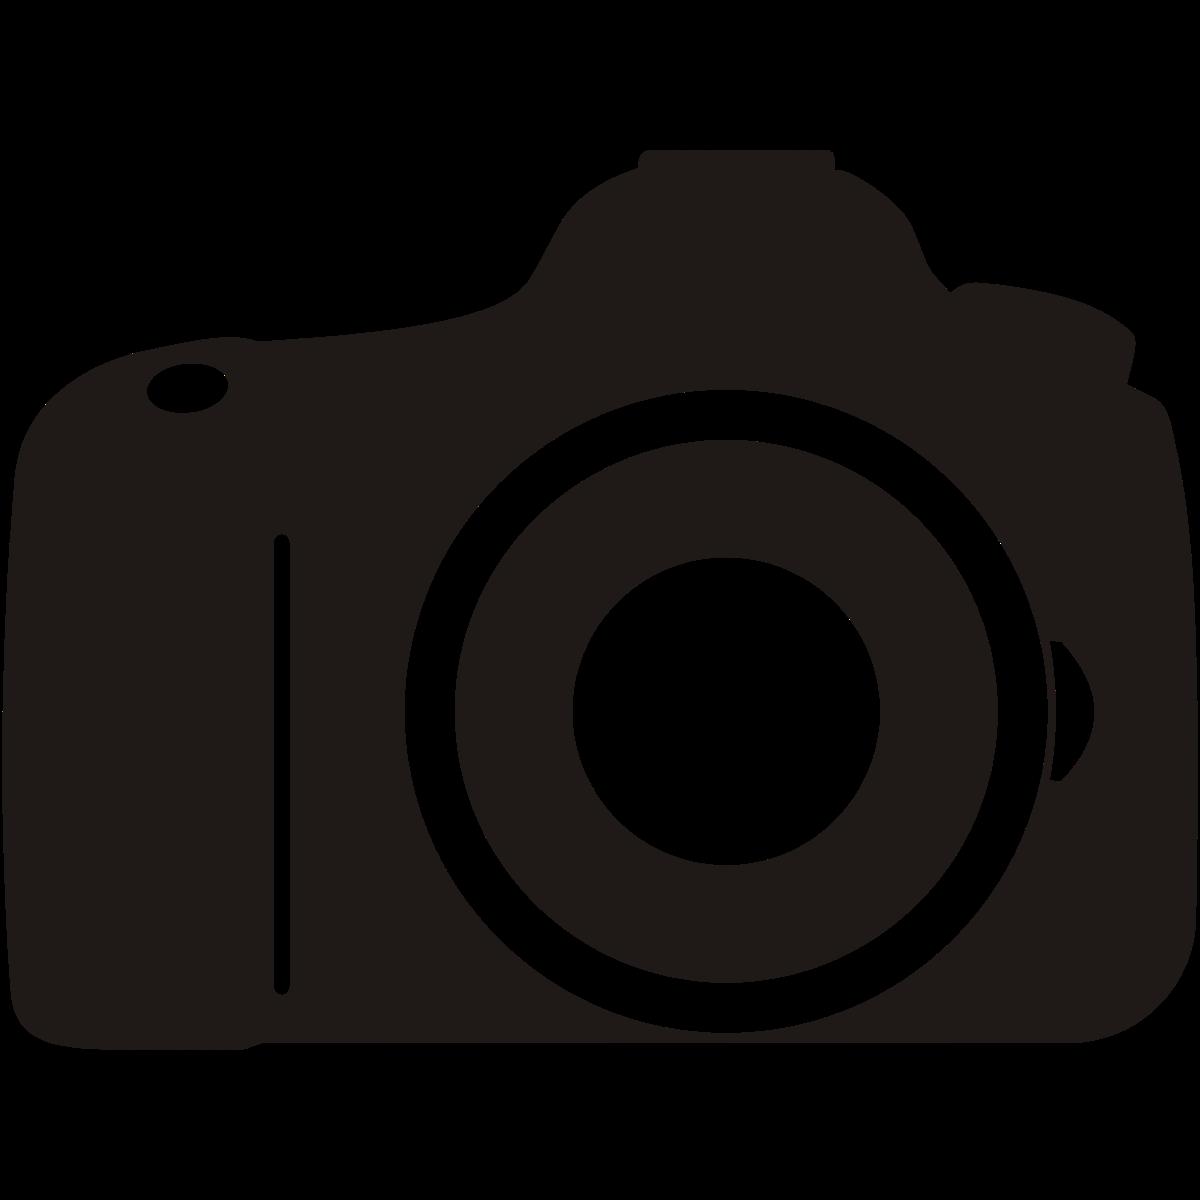 Image For Camera Icon Background Wallpaper Camera Logo Camera Icon Photography Camera